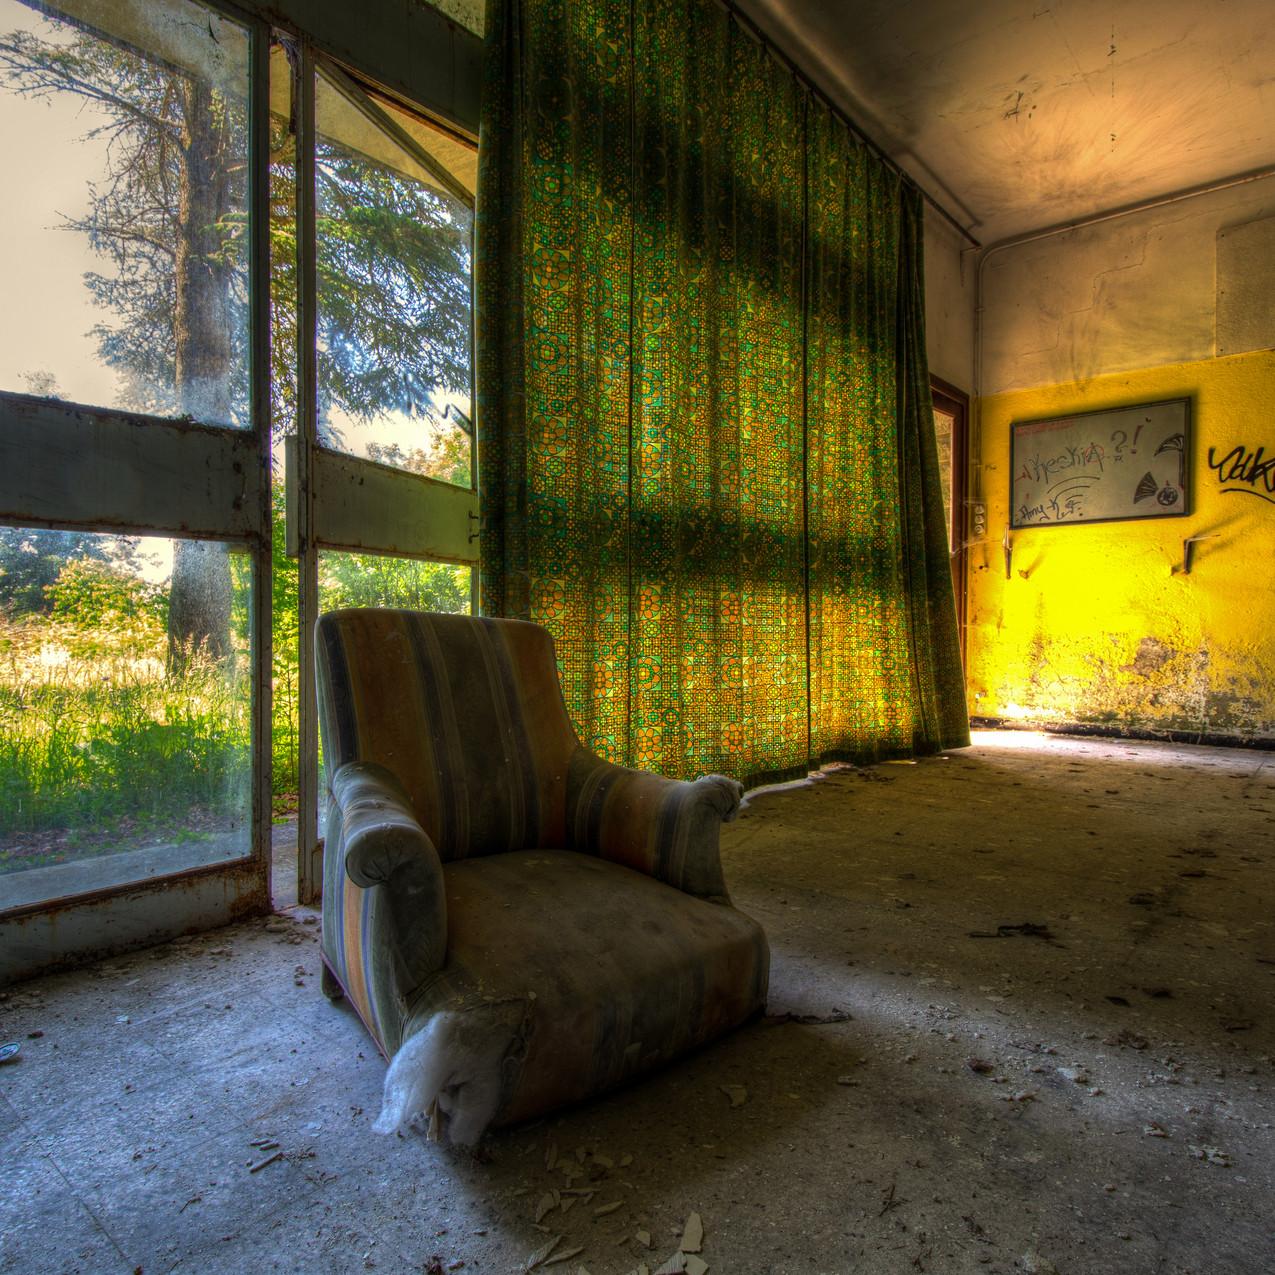 Urbex - Sanatorium aux tisanes (Paresse _ habitude prise de se reposer avant la fatigue